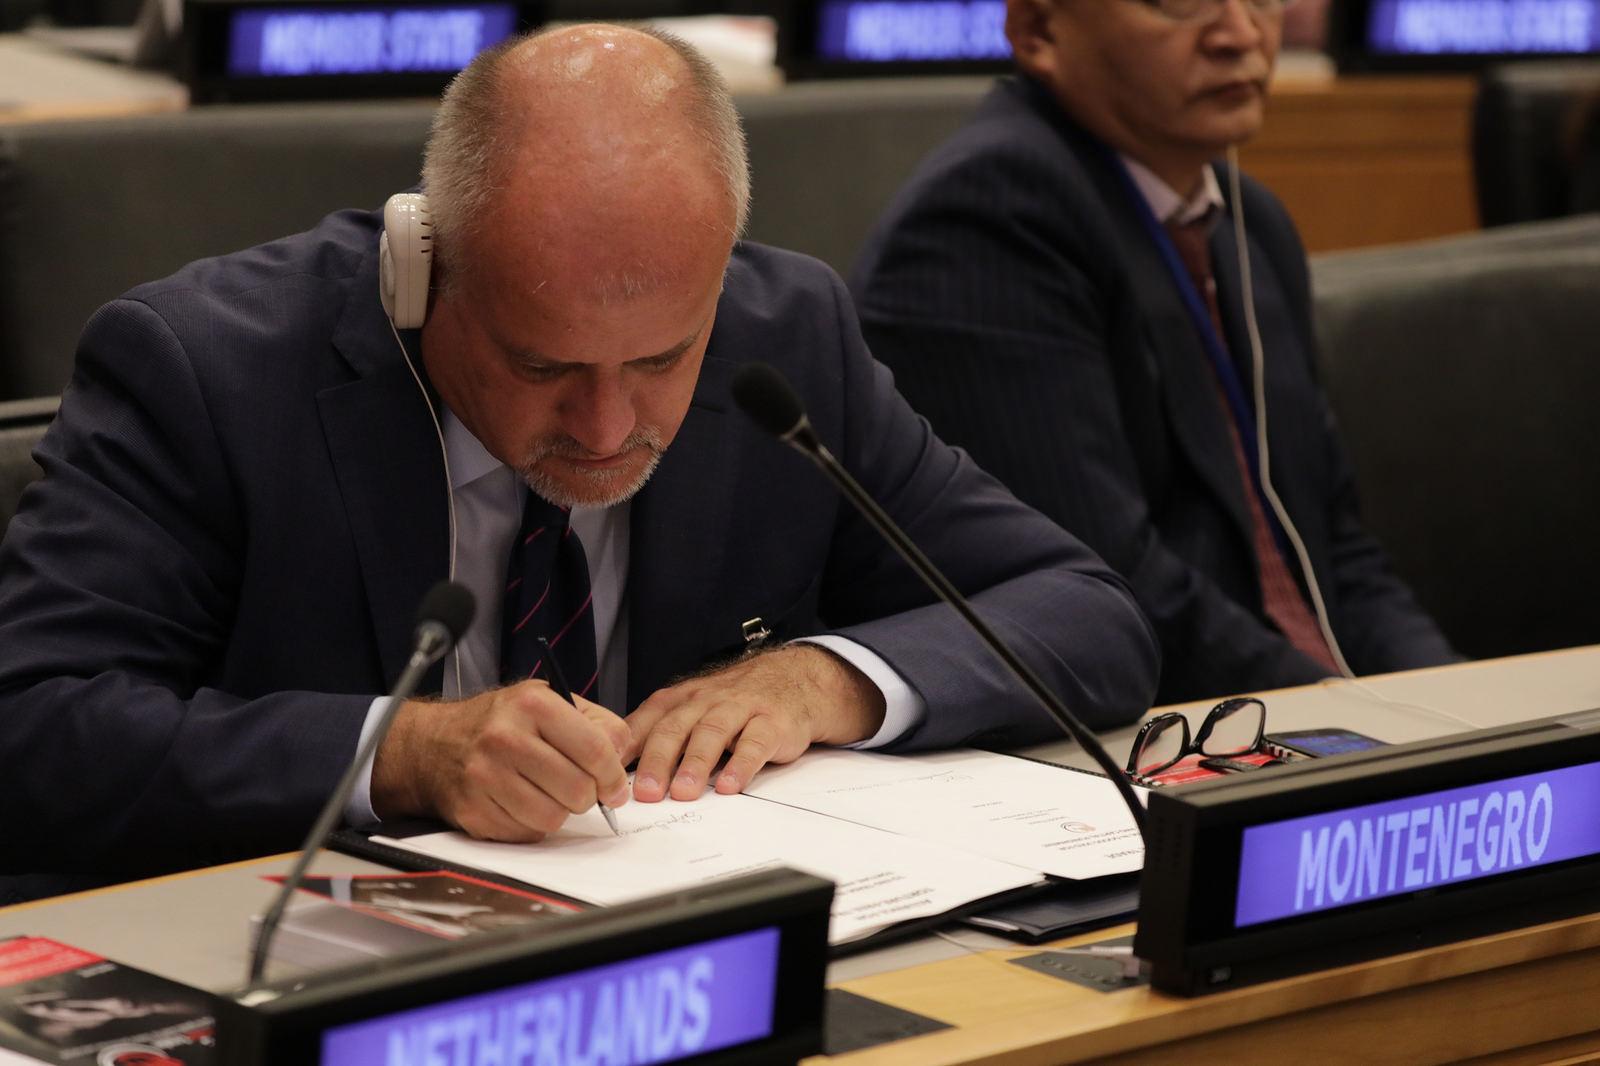 Darmanović: Montenegro 'provides unambiguous support to'Torture-Free Trade global Initiative